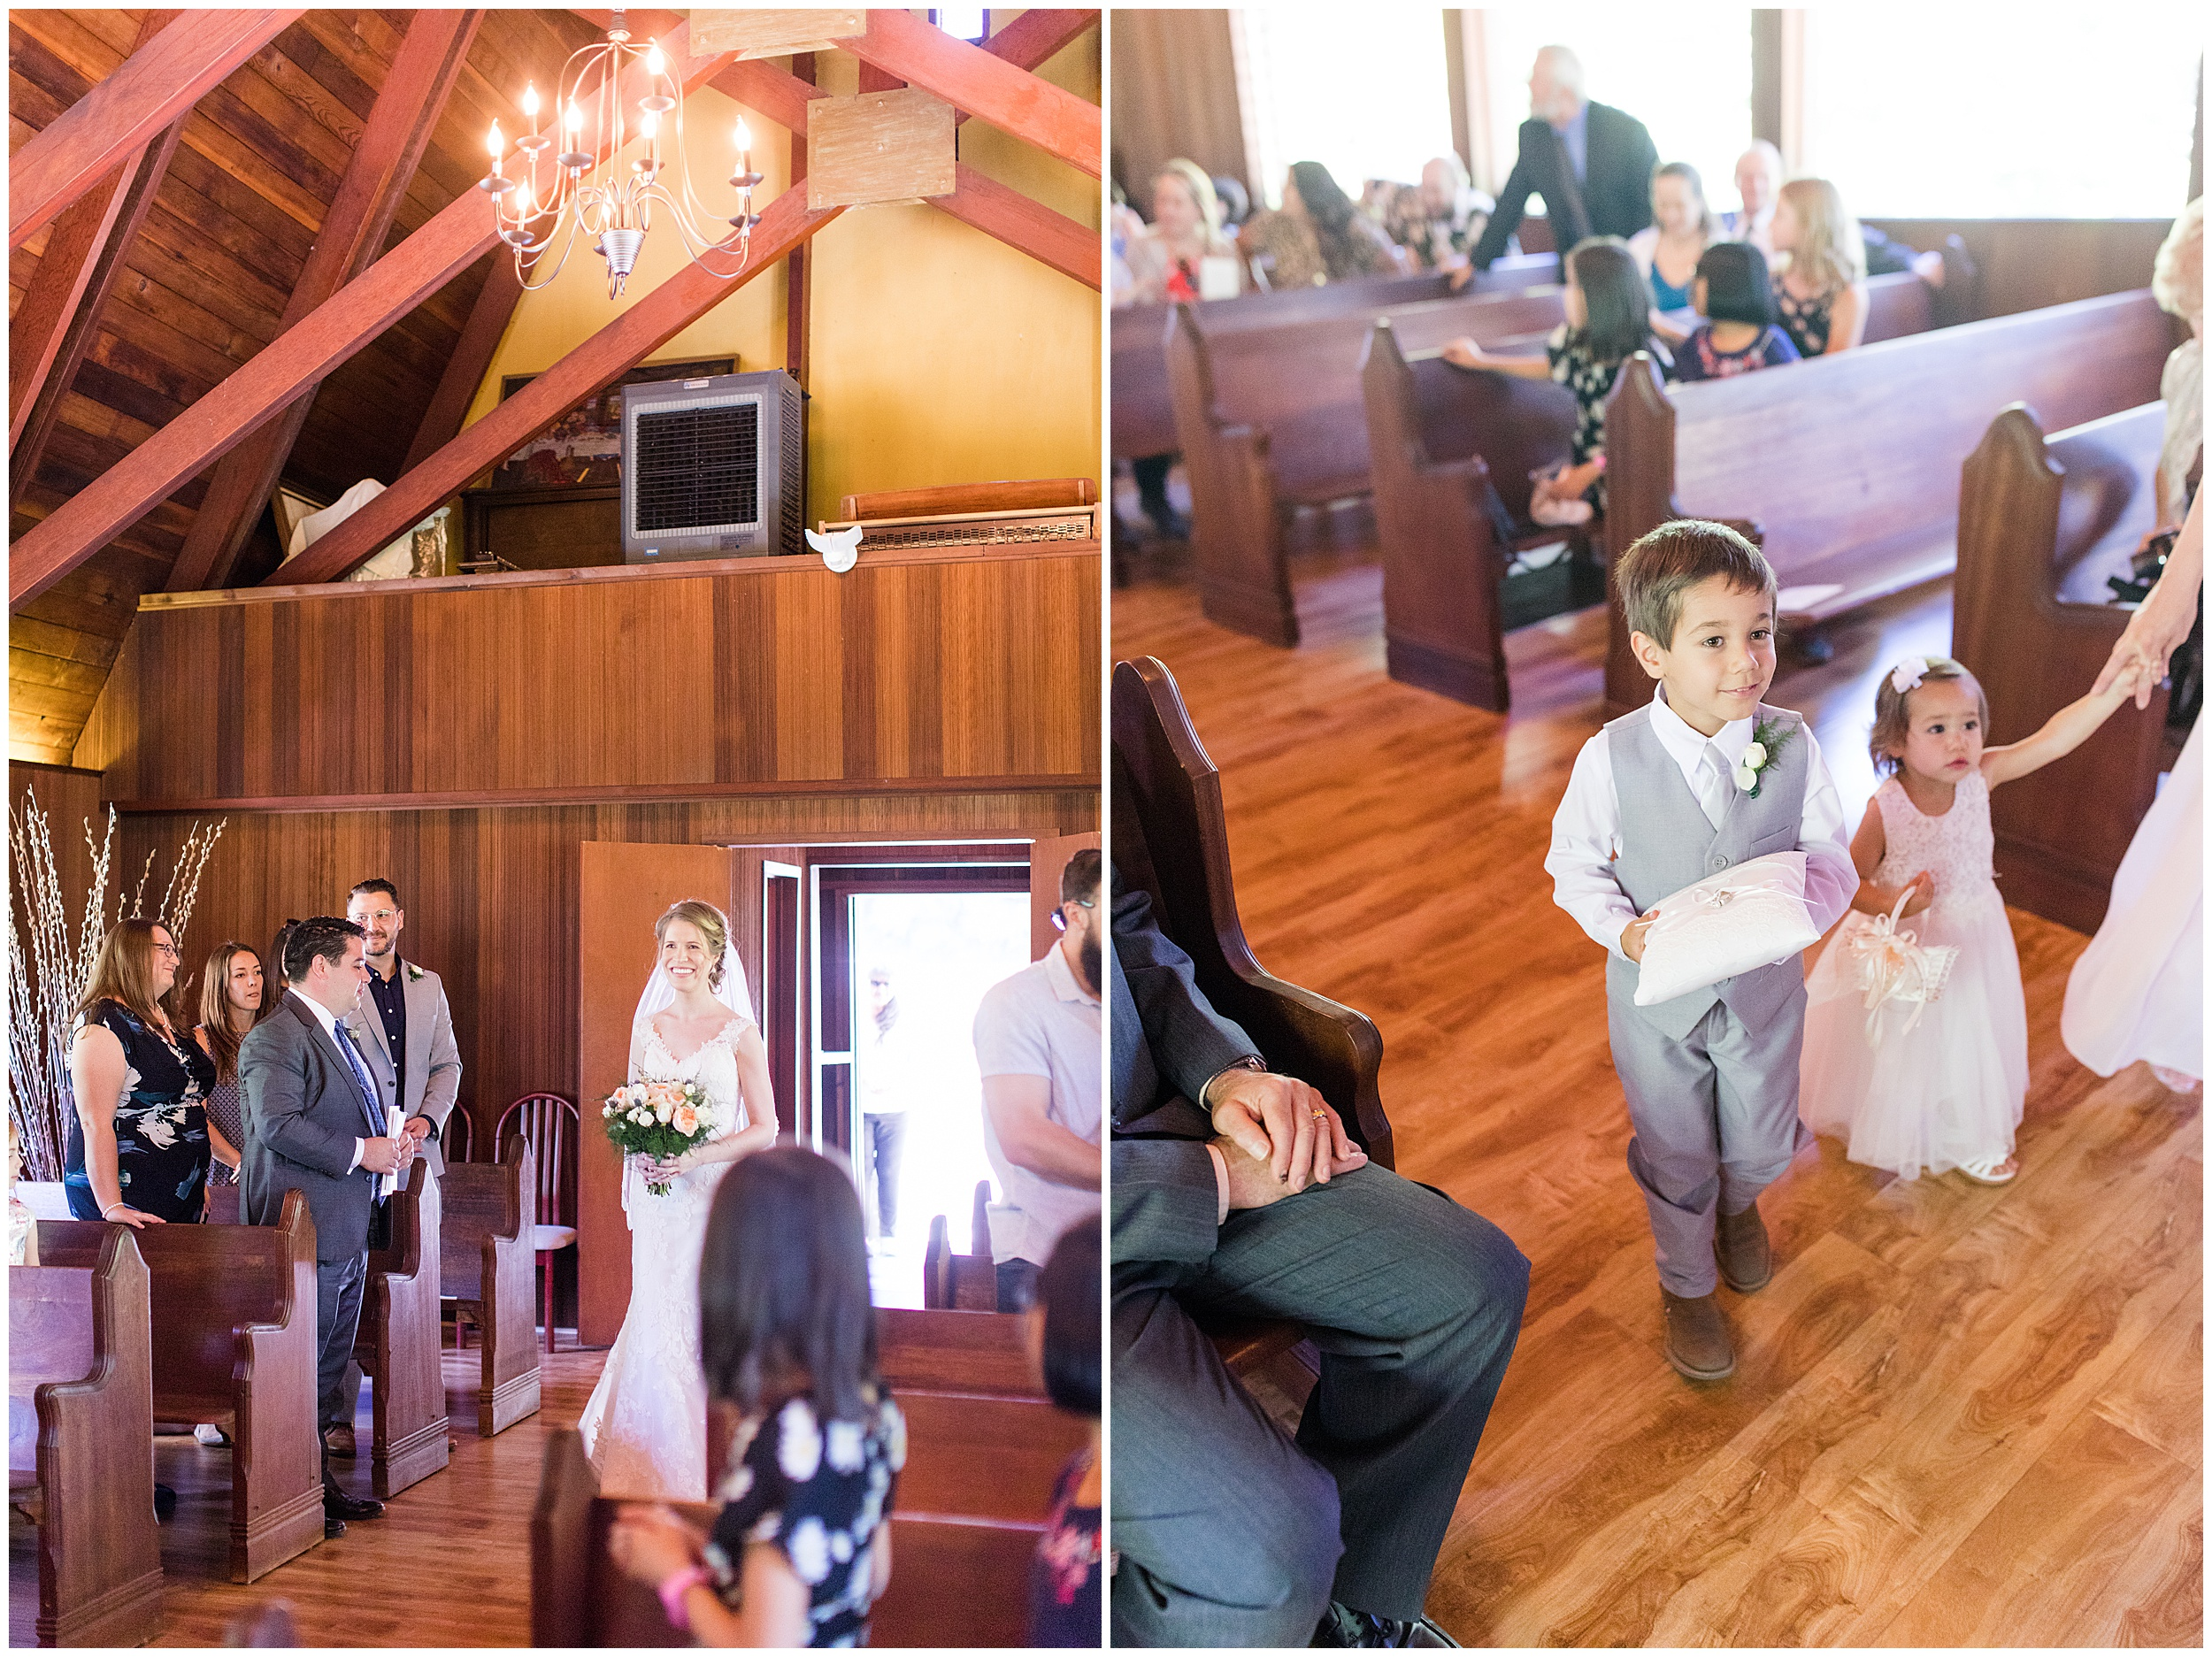 2019 chapel on the hill los gatos san jose bay area wedding photographer angela sue photography_0027.jpg